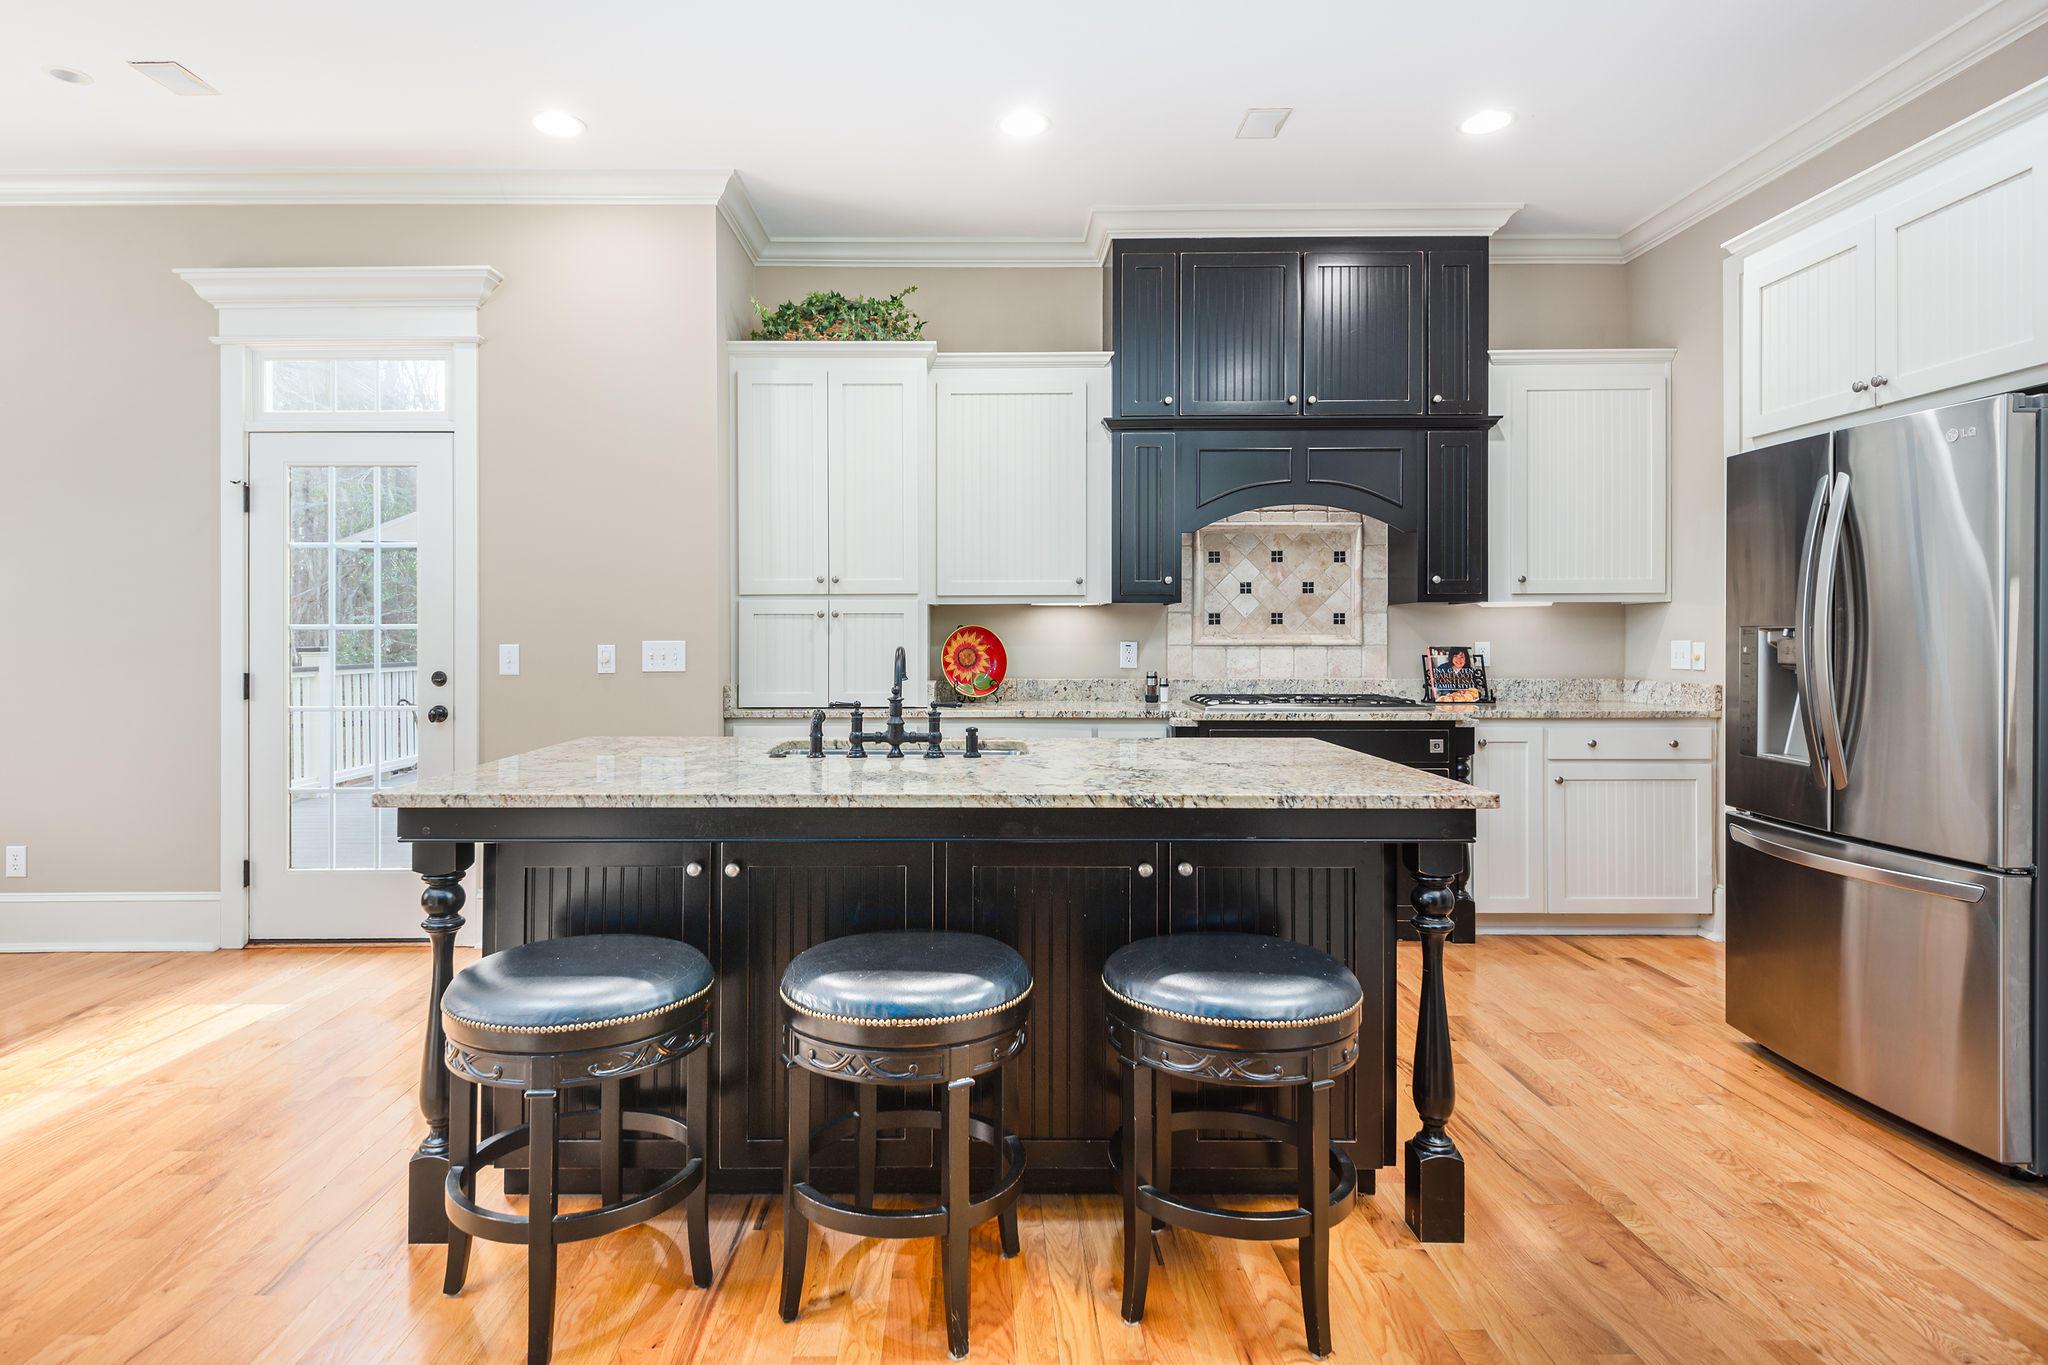 Dunes West Homes For Sale - 1305 King Bird, Mount Pleasant, SC - 55